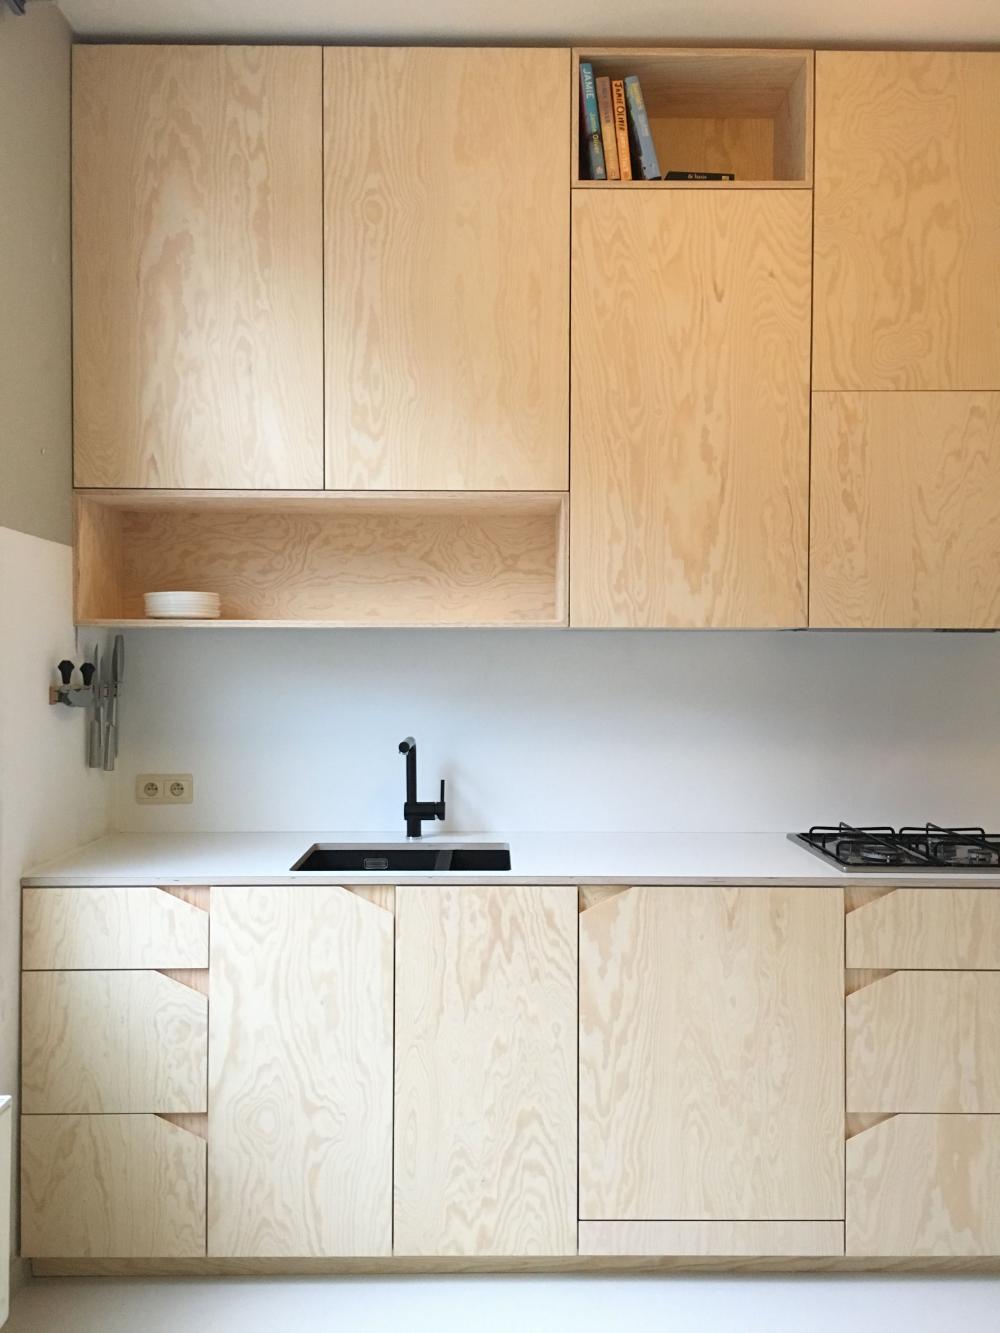 Cnc Plywood Kitchen Cabinets Google Search In 2020 Kitchen Remodel Design Black Kitchen Taps Plywood Kitchen